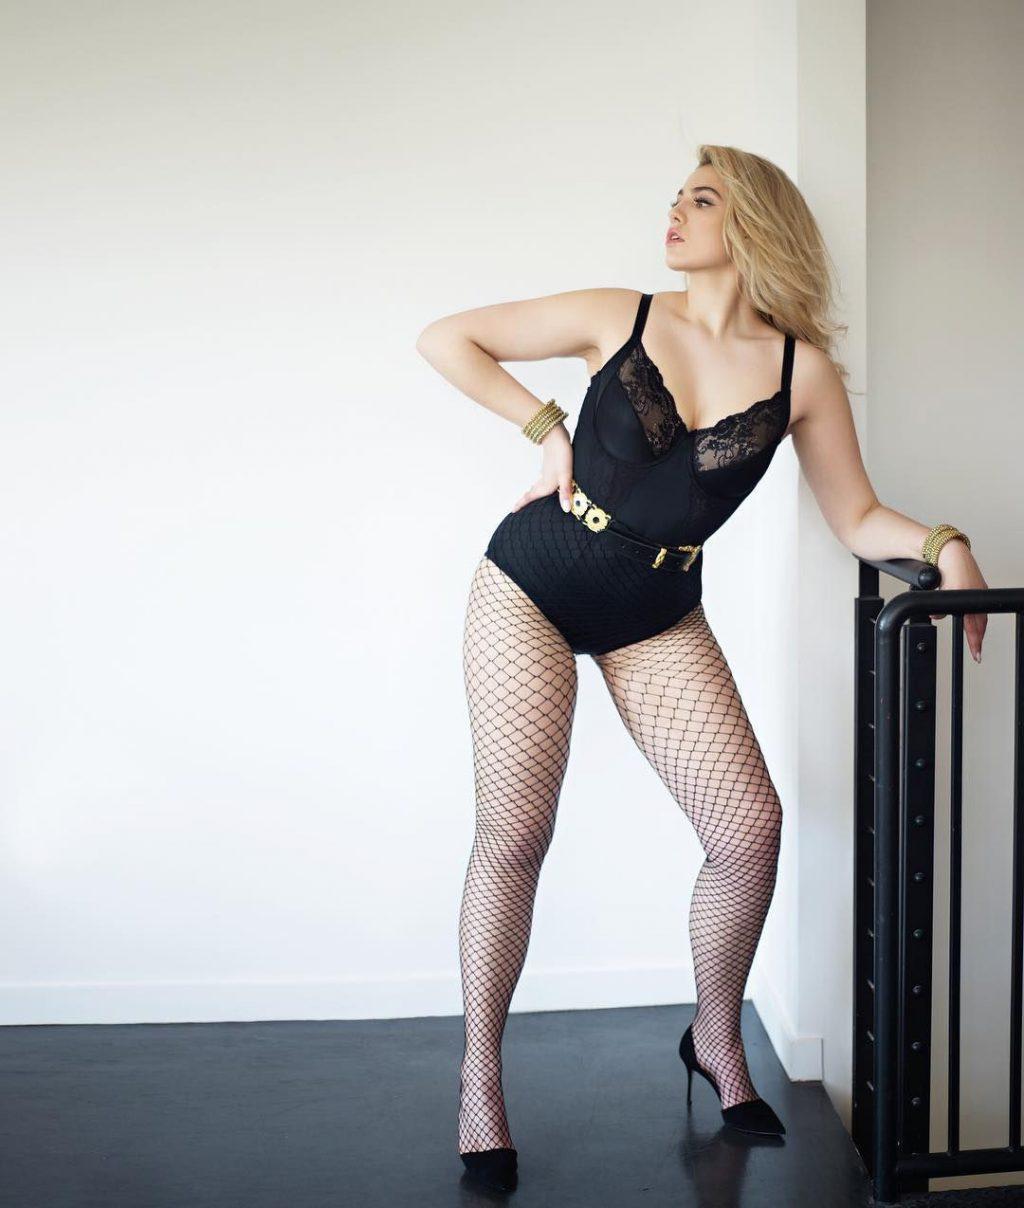 Meredith VanCuyk nudes (62 photo), pics Erotica, Twitter, panties 2015